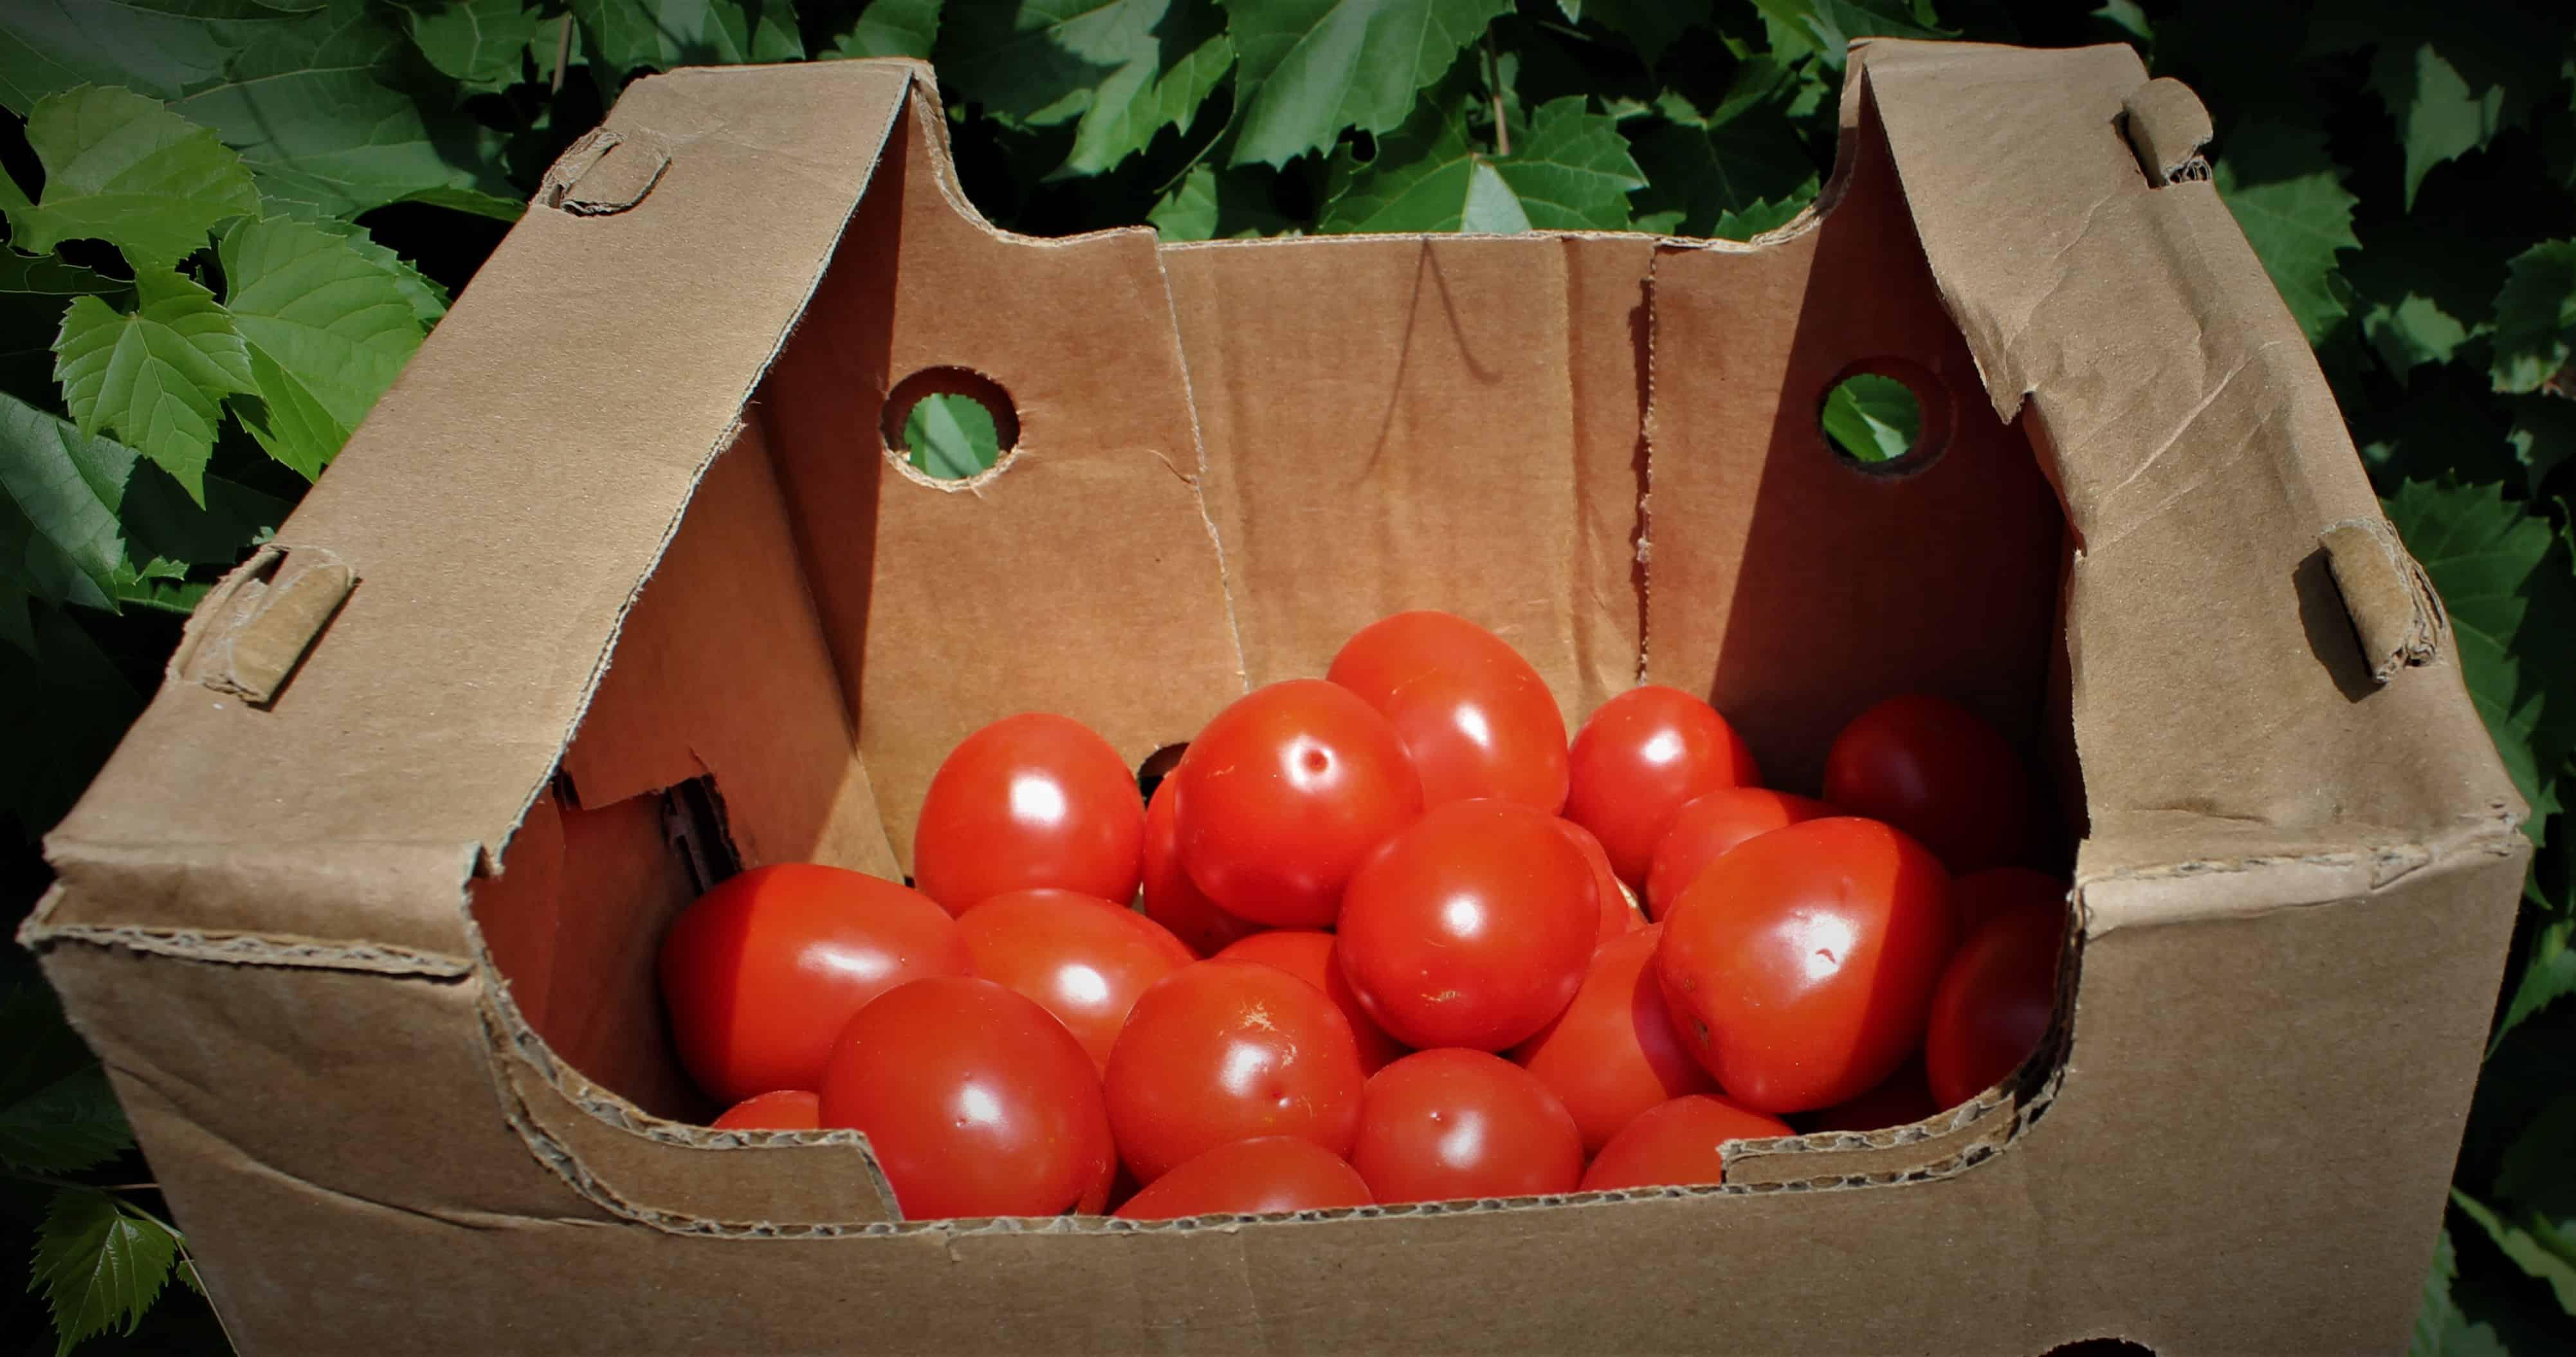 Tomatoes – Roma LOCAL Ferme la Corne de l'Abondance (BULK 5LB Box)